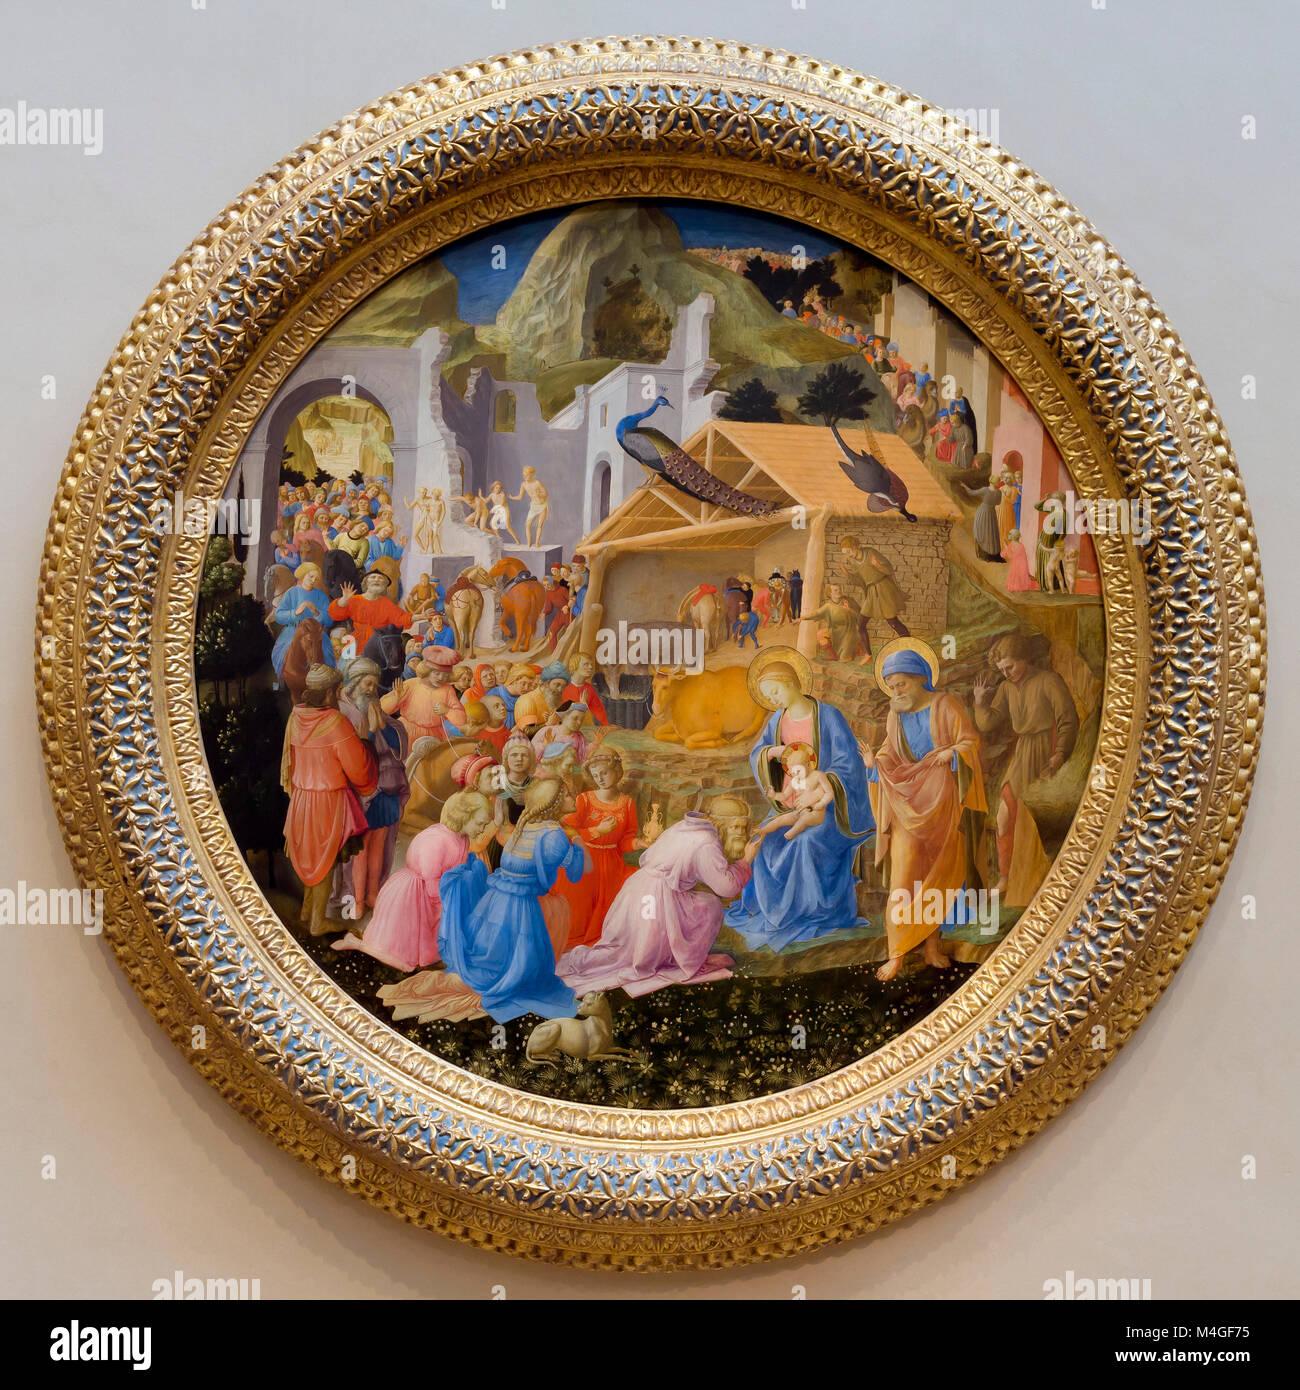 The Adoration of the Magi, Fra Angelico and Fra Filippo Lippi, circa 1440-1460, National Gallery of Art, Washington - Stock Image